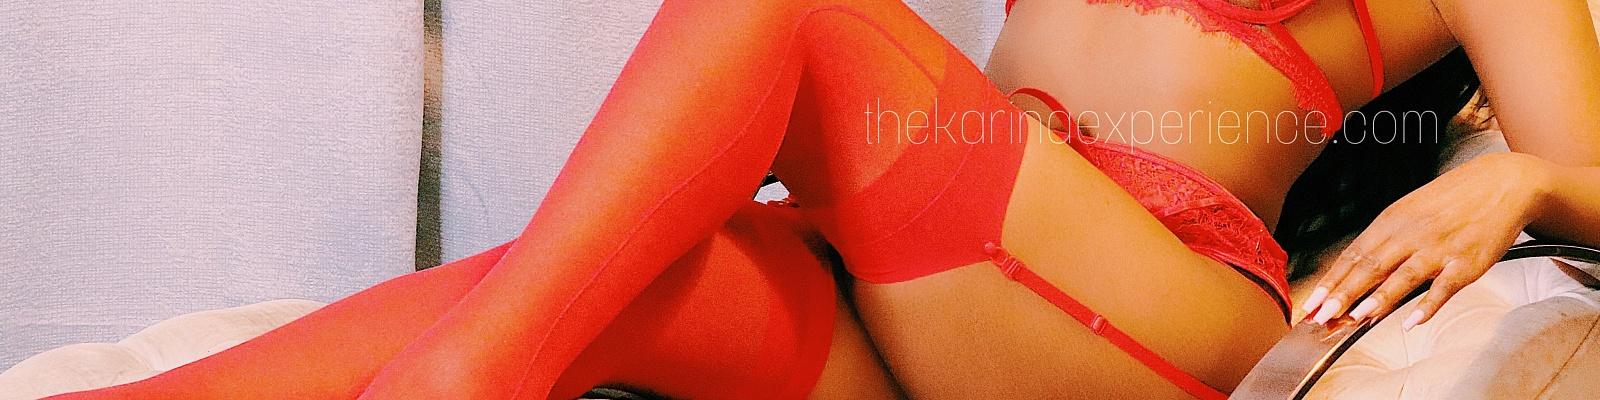 Karina Pryde's Cover Photo